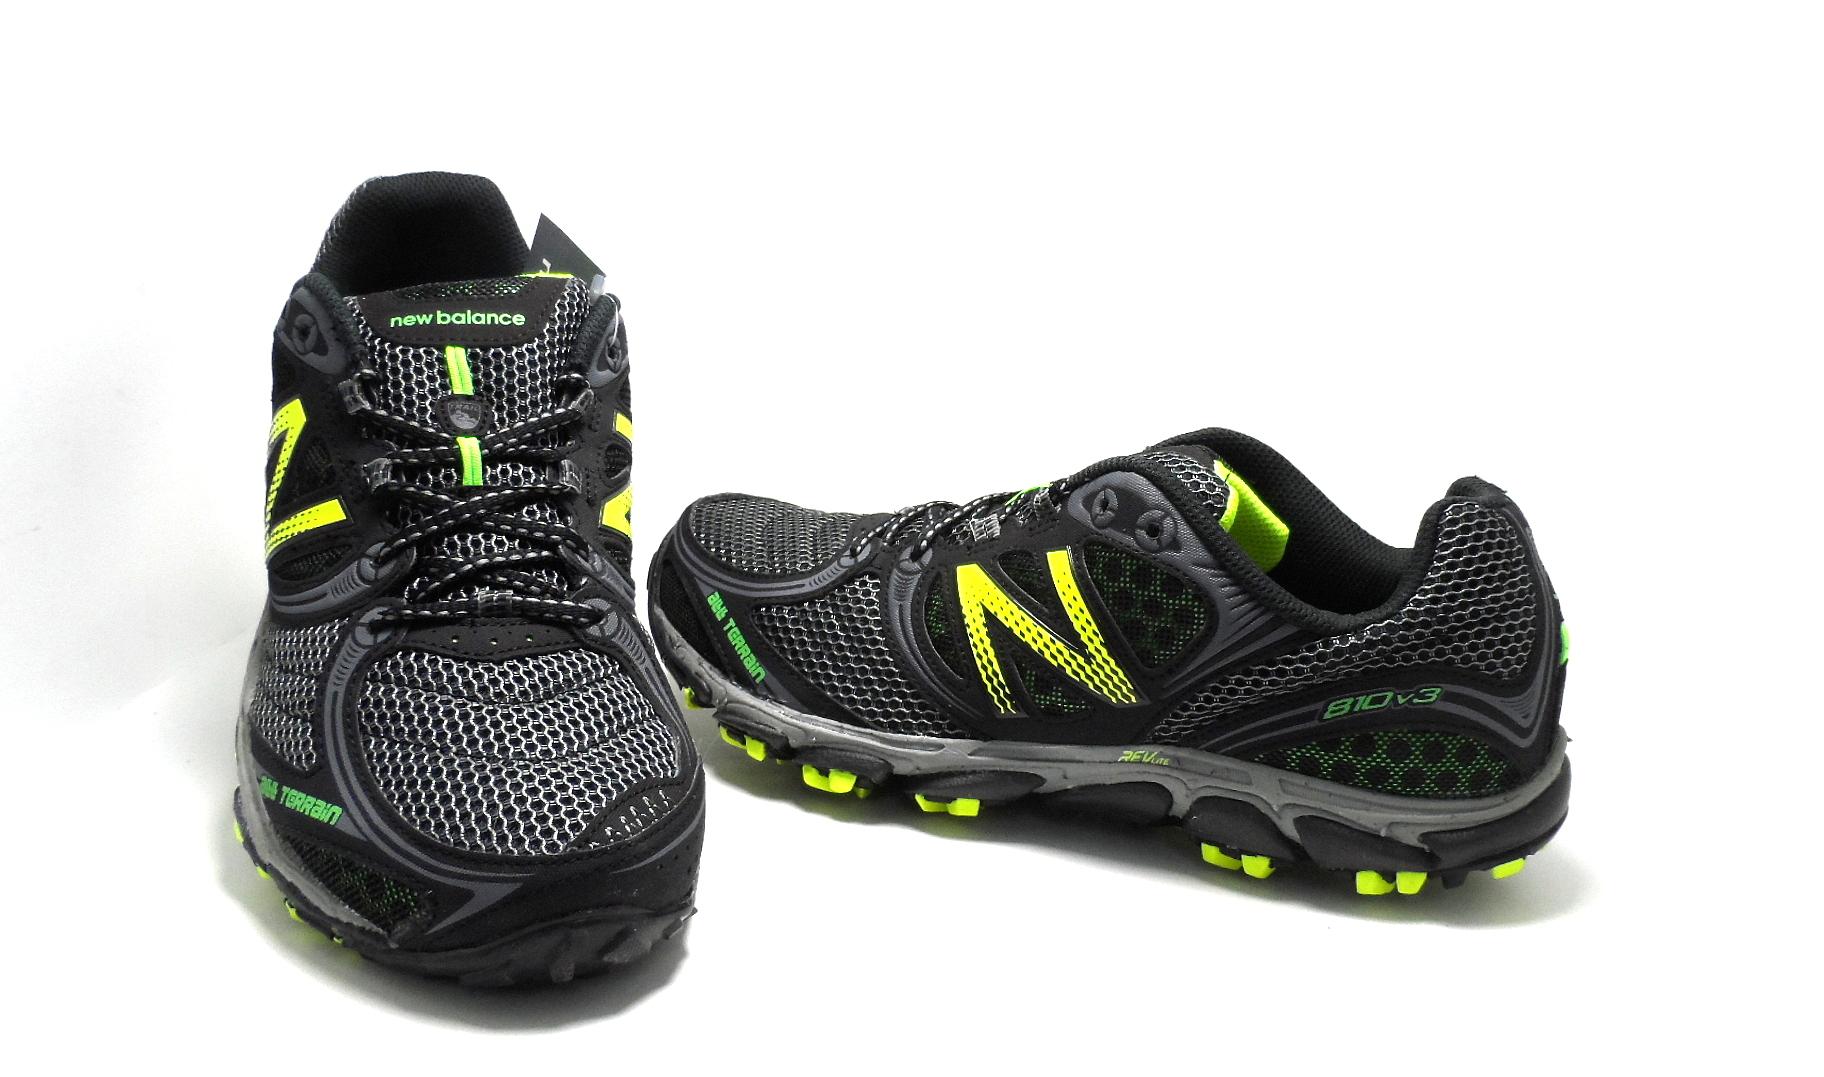 New Balance Men's MT810v3 Trail Running Shoe | eBay